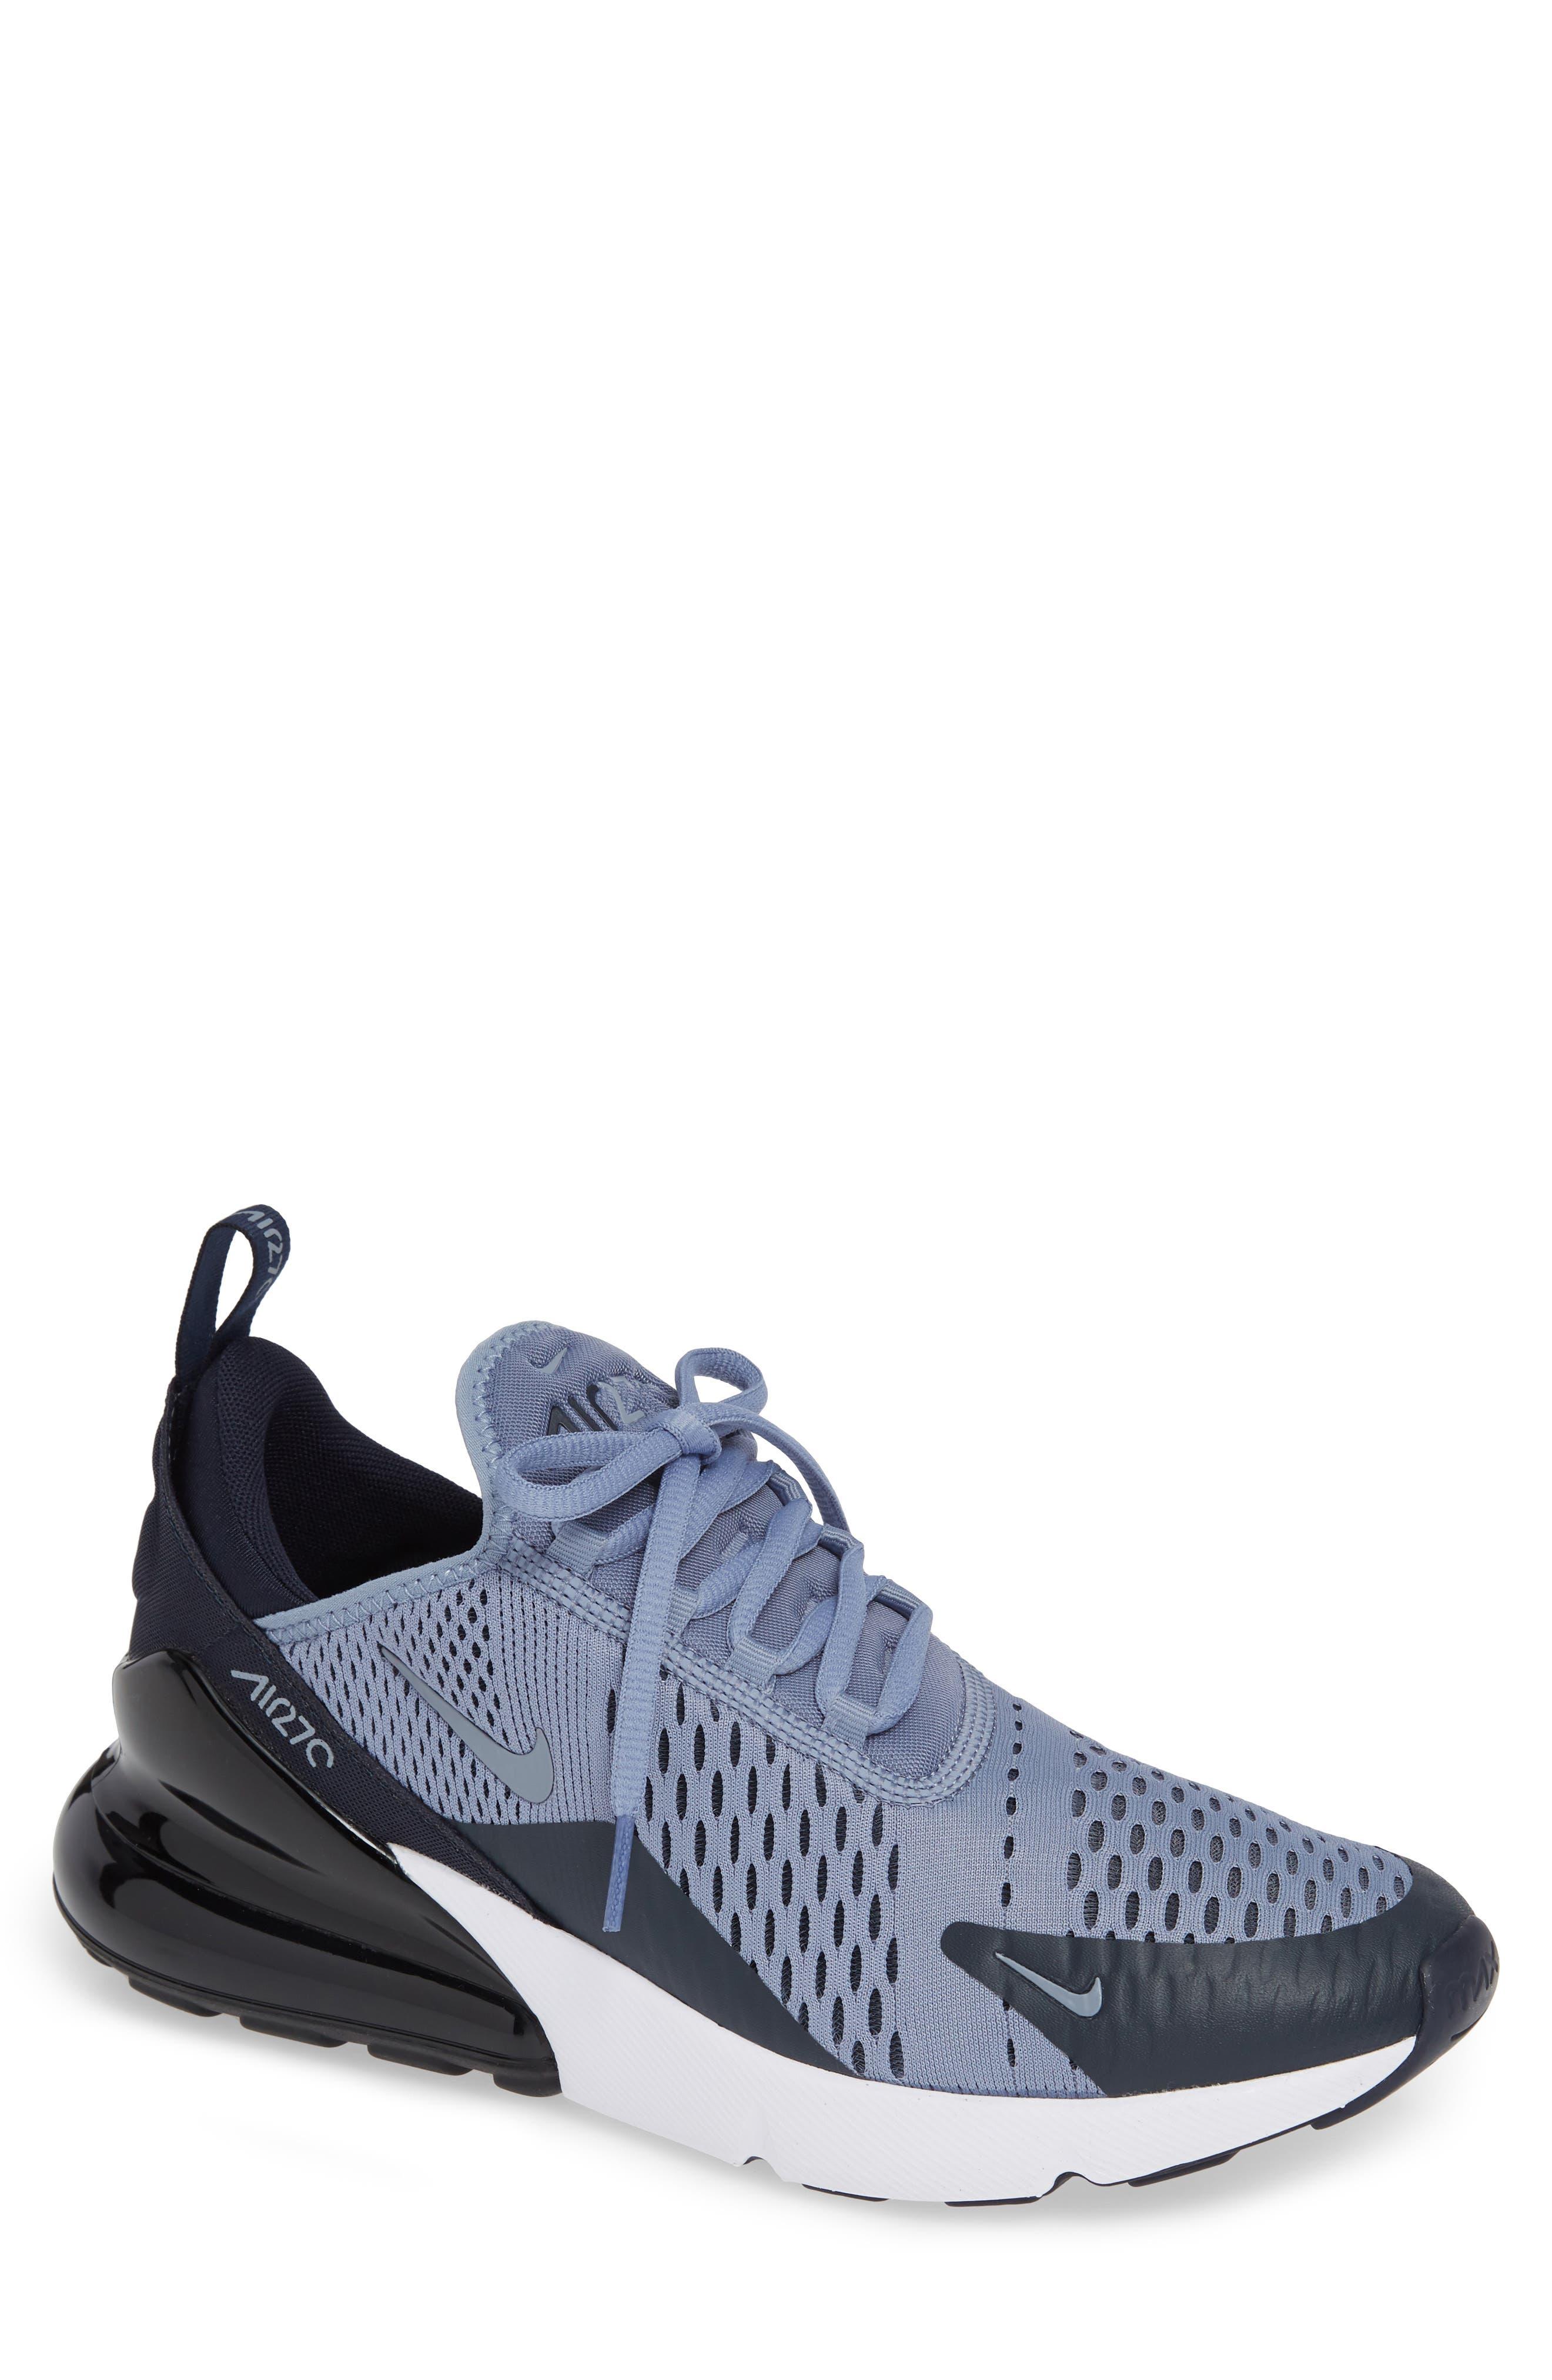 Air Max 270 Sneaker,                         Main,                         color, ASHEN SLATE/ BLACK